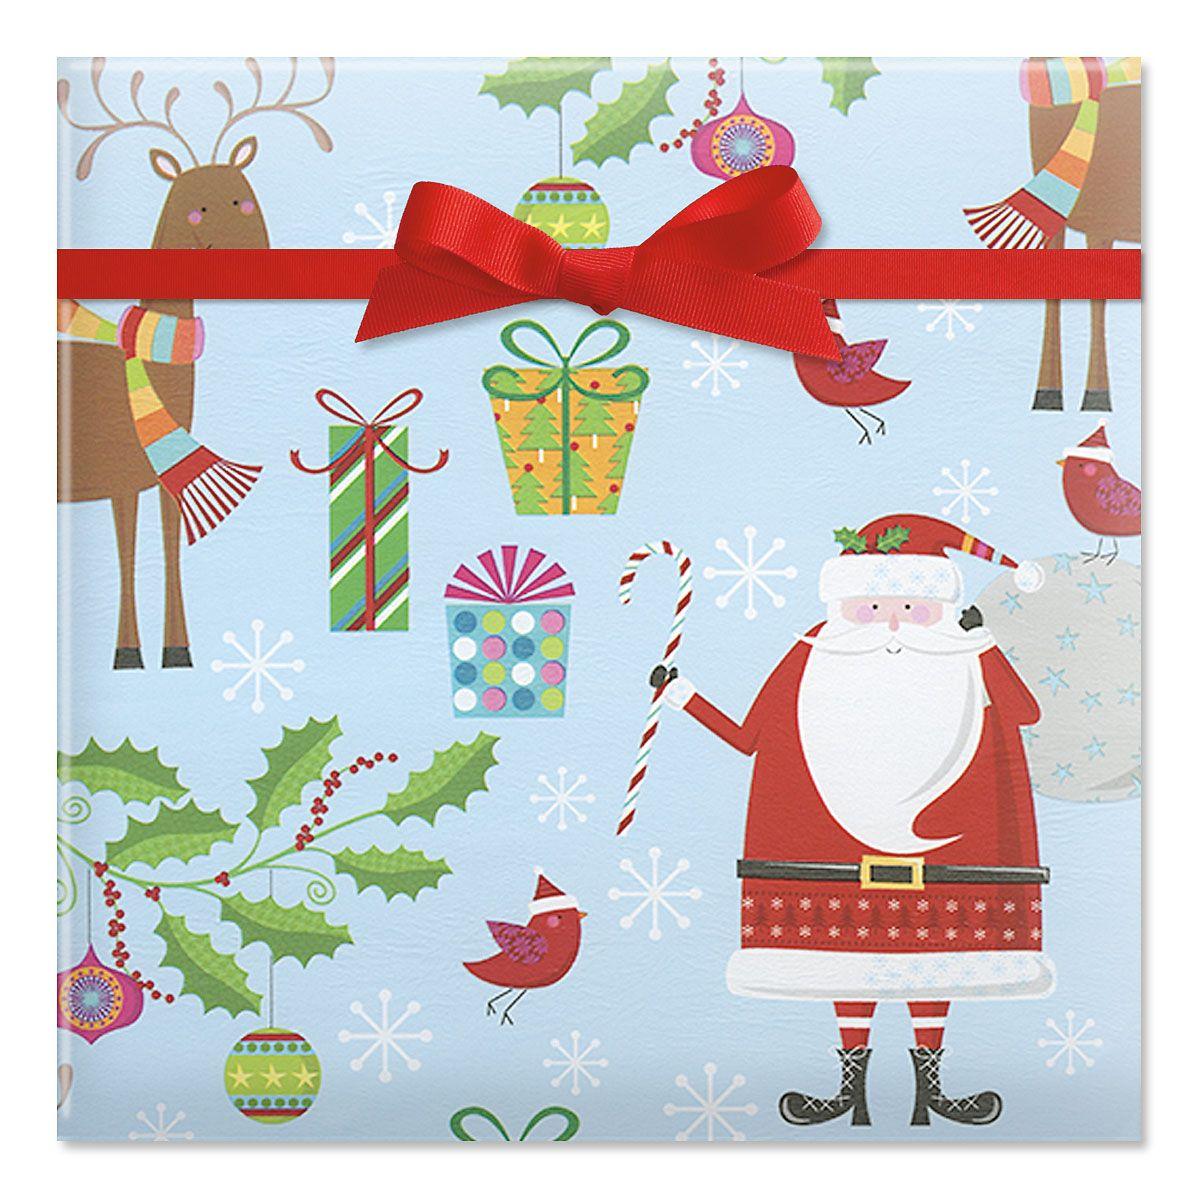 Santa's Reindeer Jumbo Rolled Gift Wrap